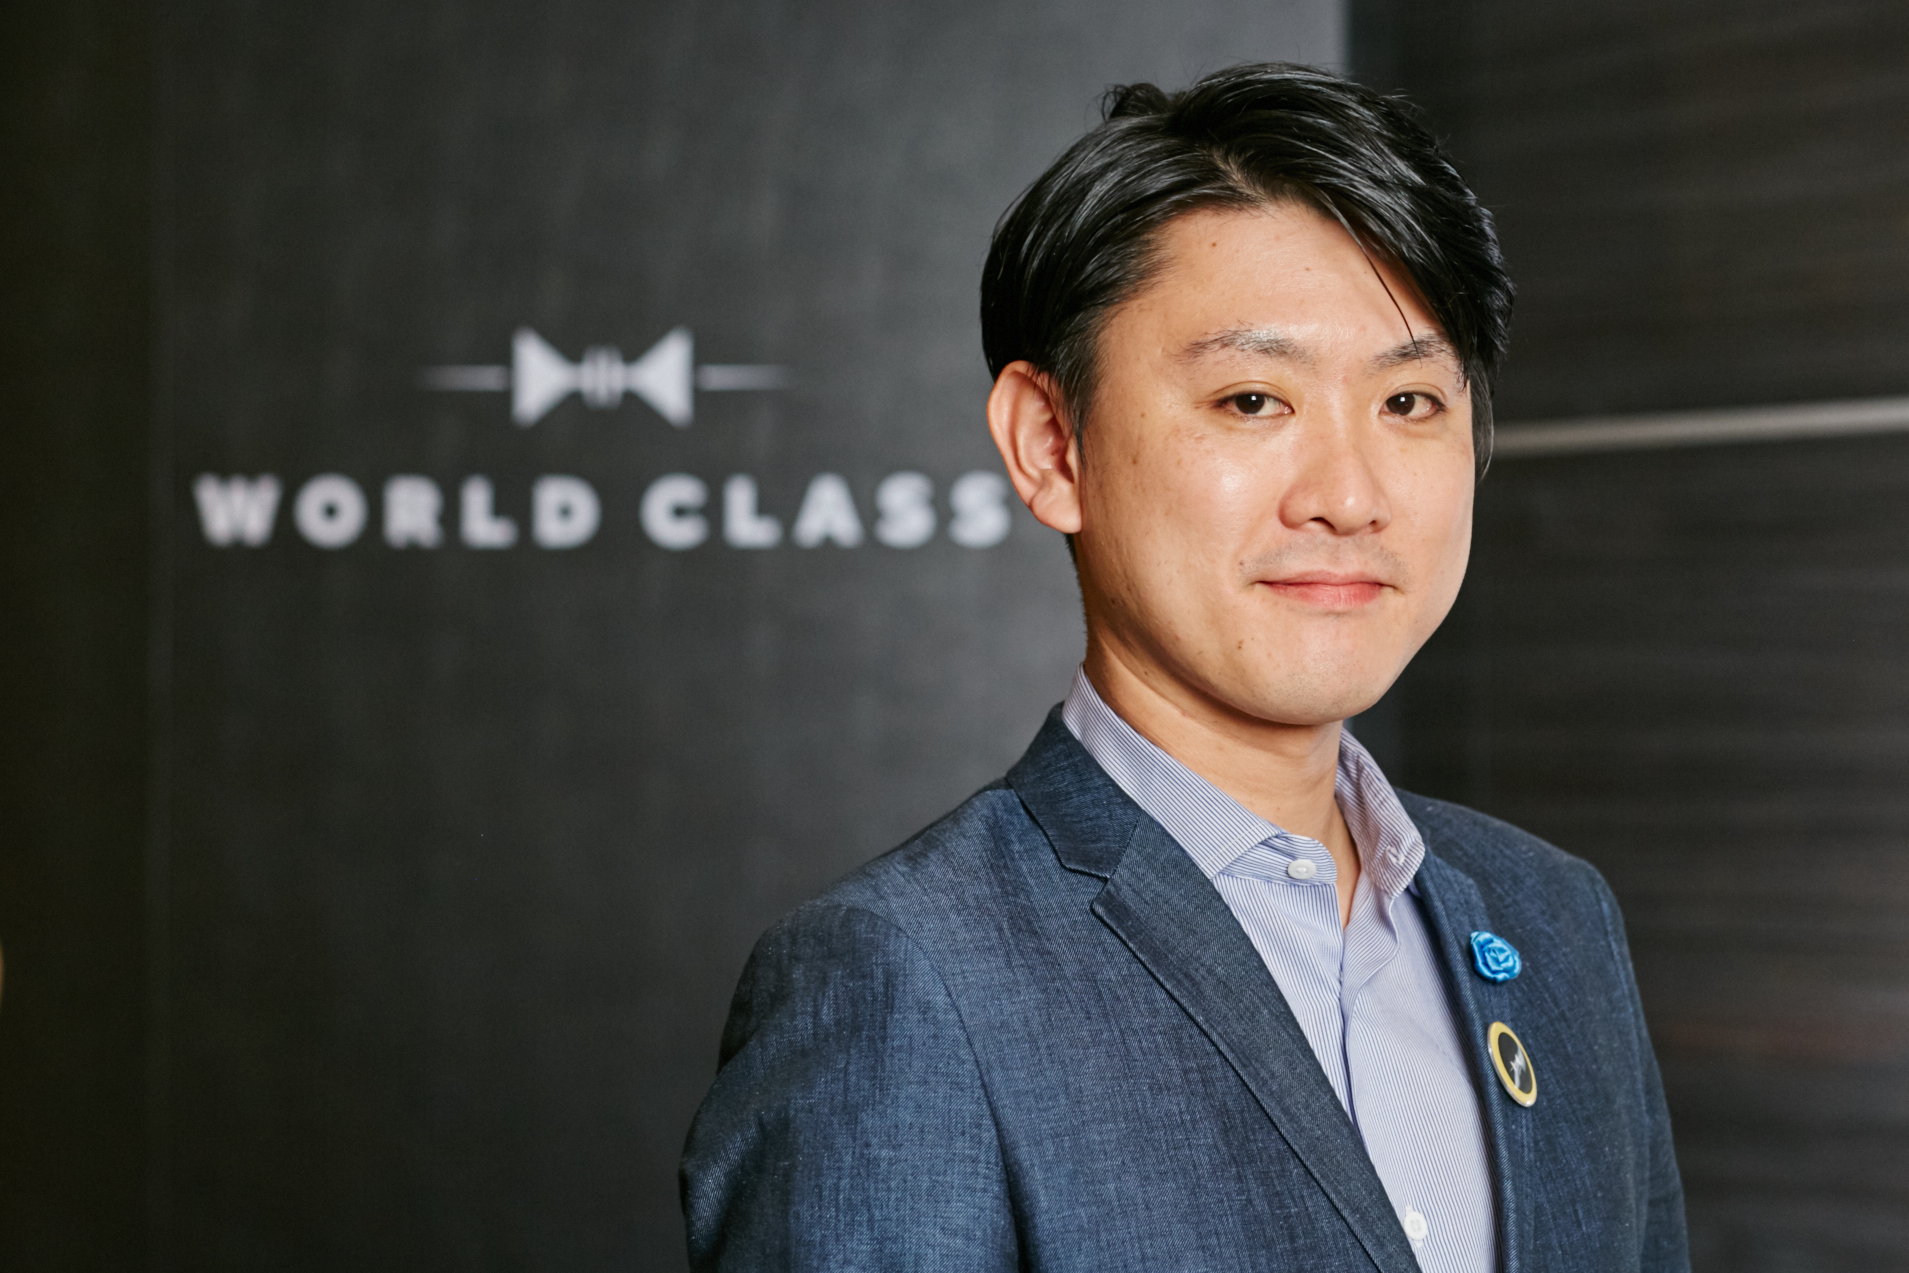 Ganador de la World Class Competition 2015, certamen de coctelería, Michito Kaneko